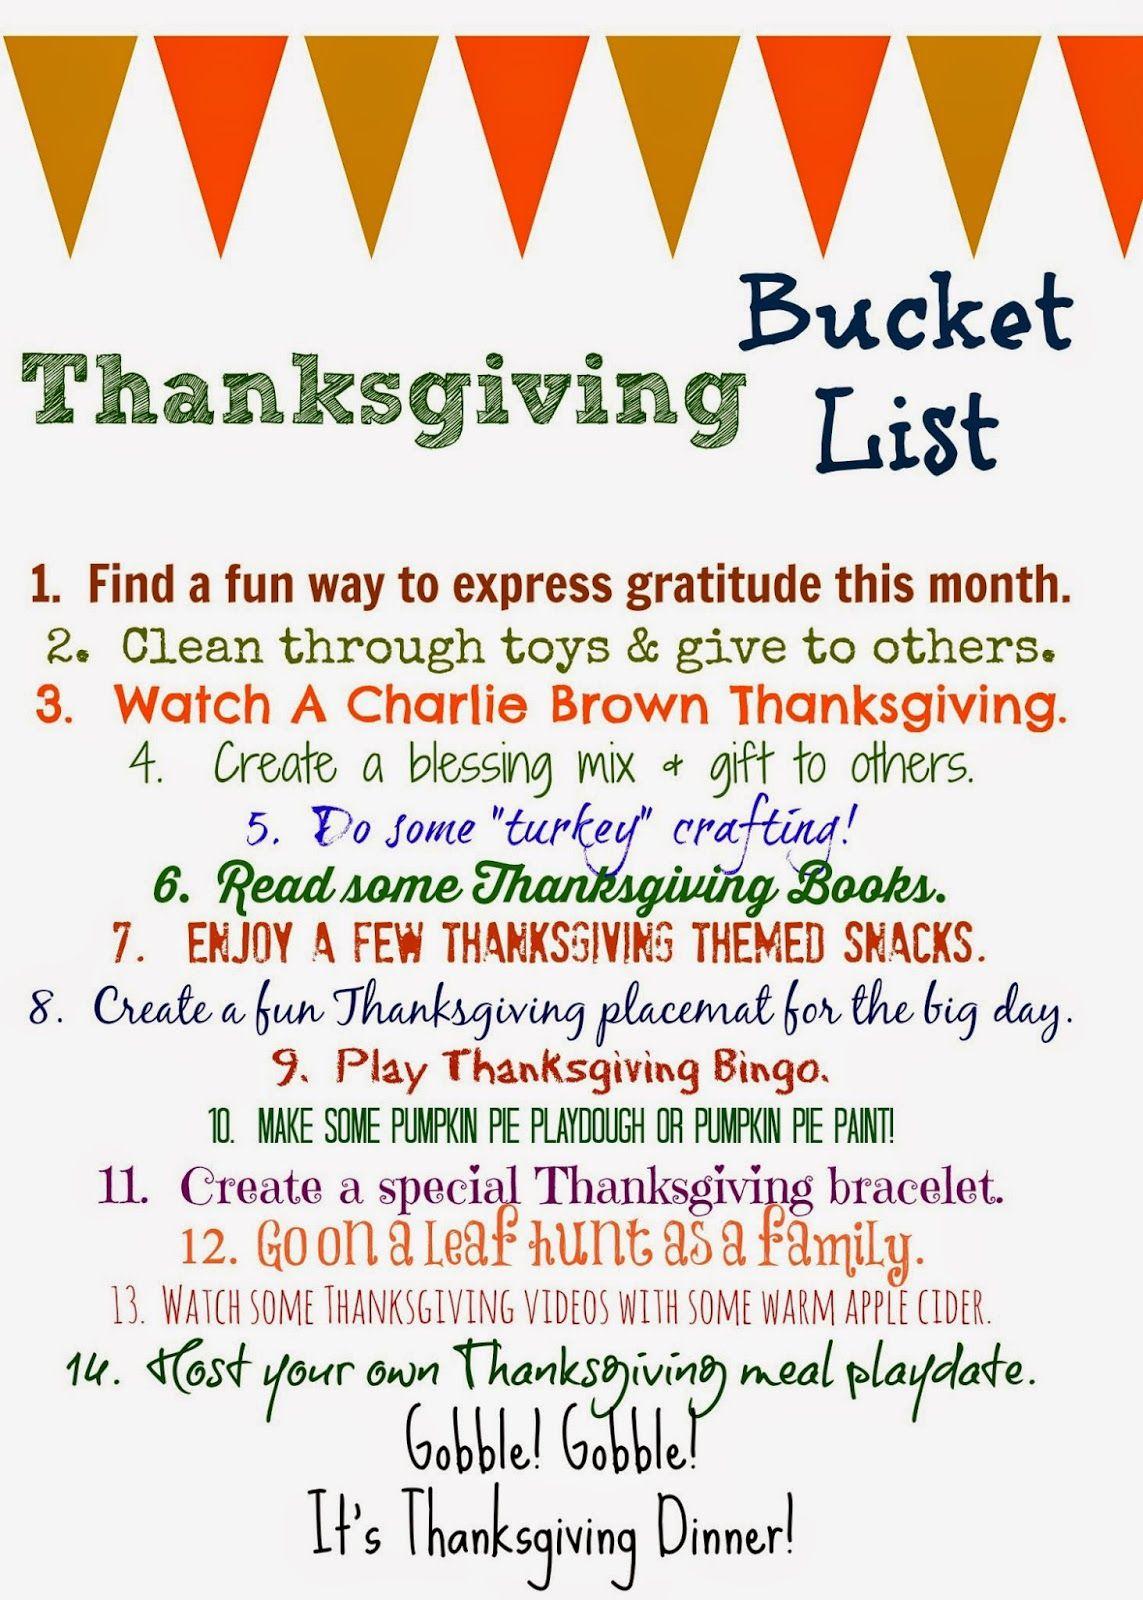 Thanksgiving Bucket List (Free Printable Thanksgiving